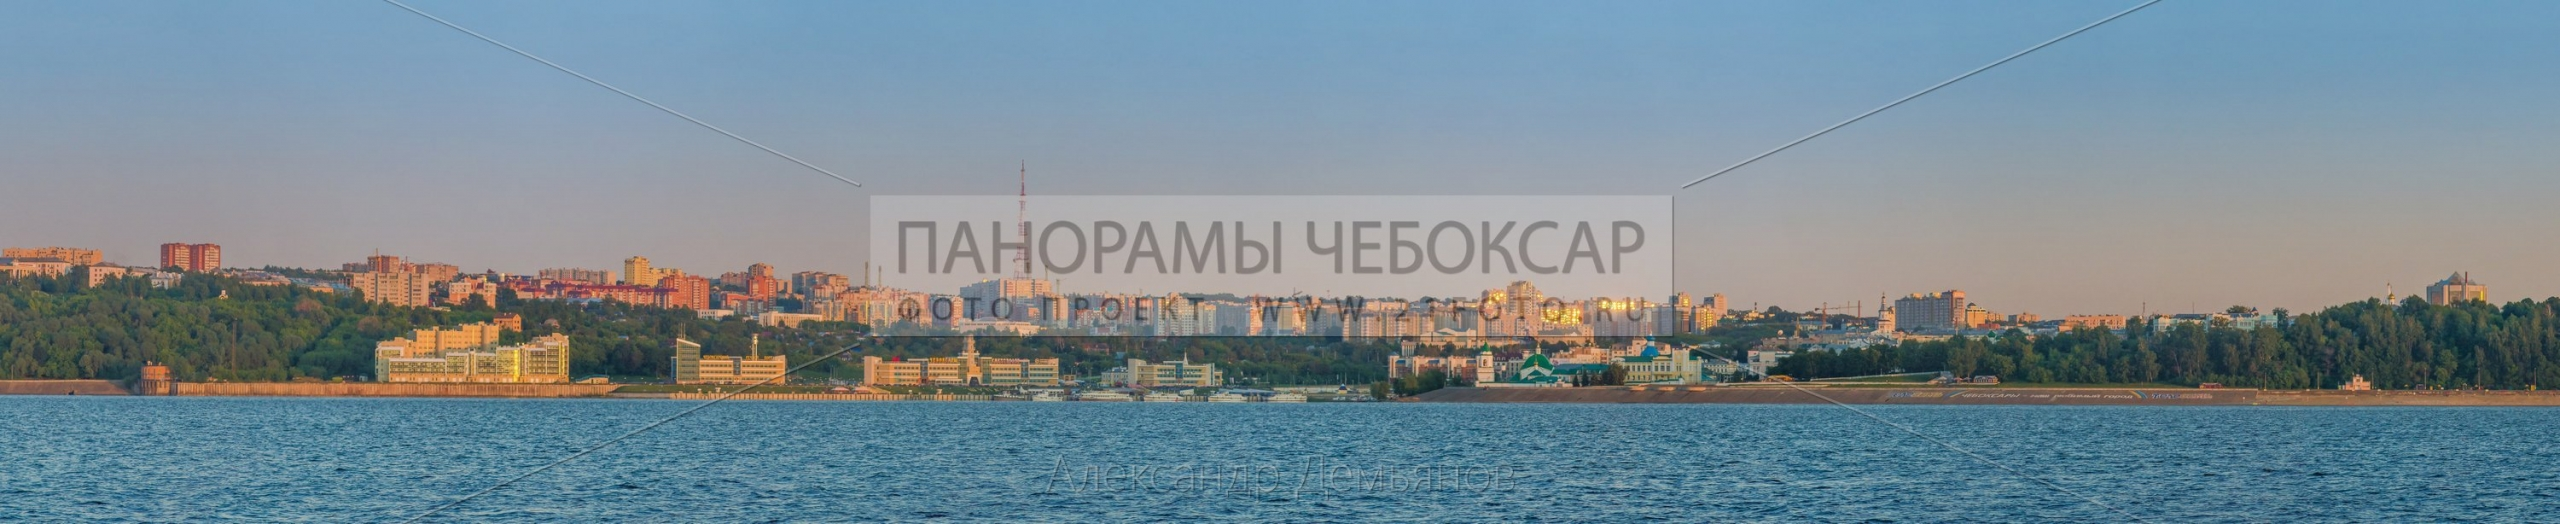 Закат с Чебоксарского заволжья